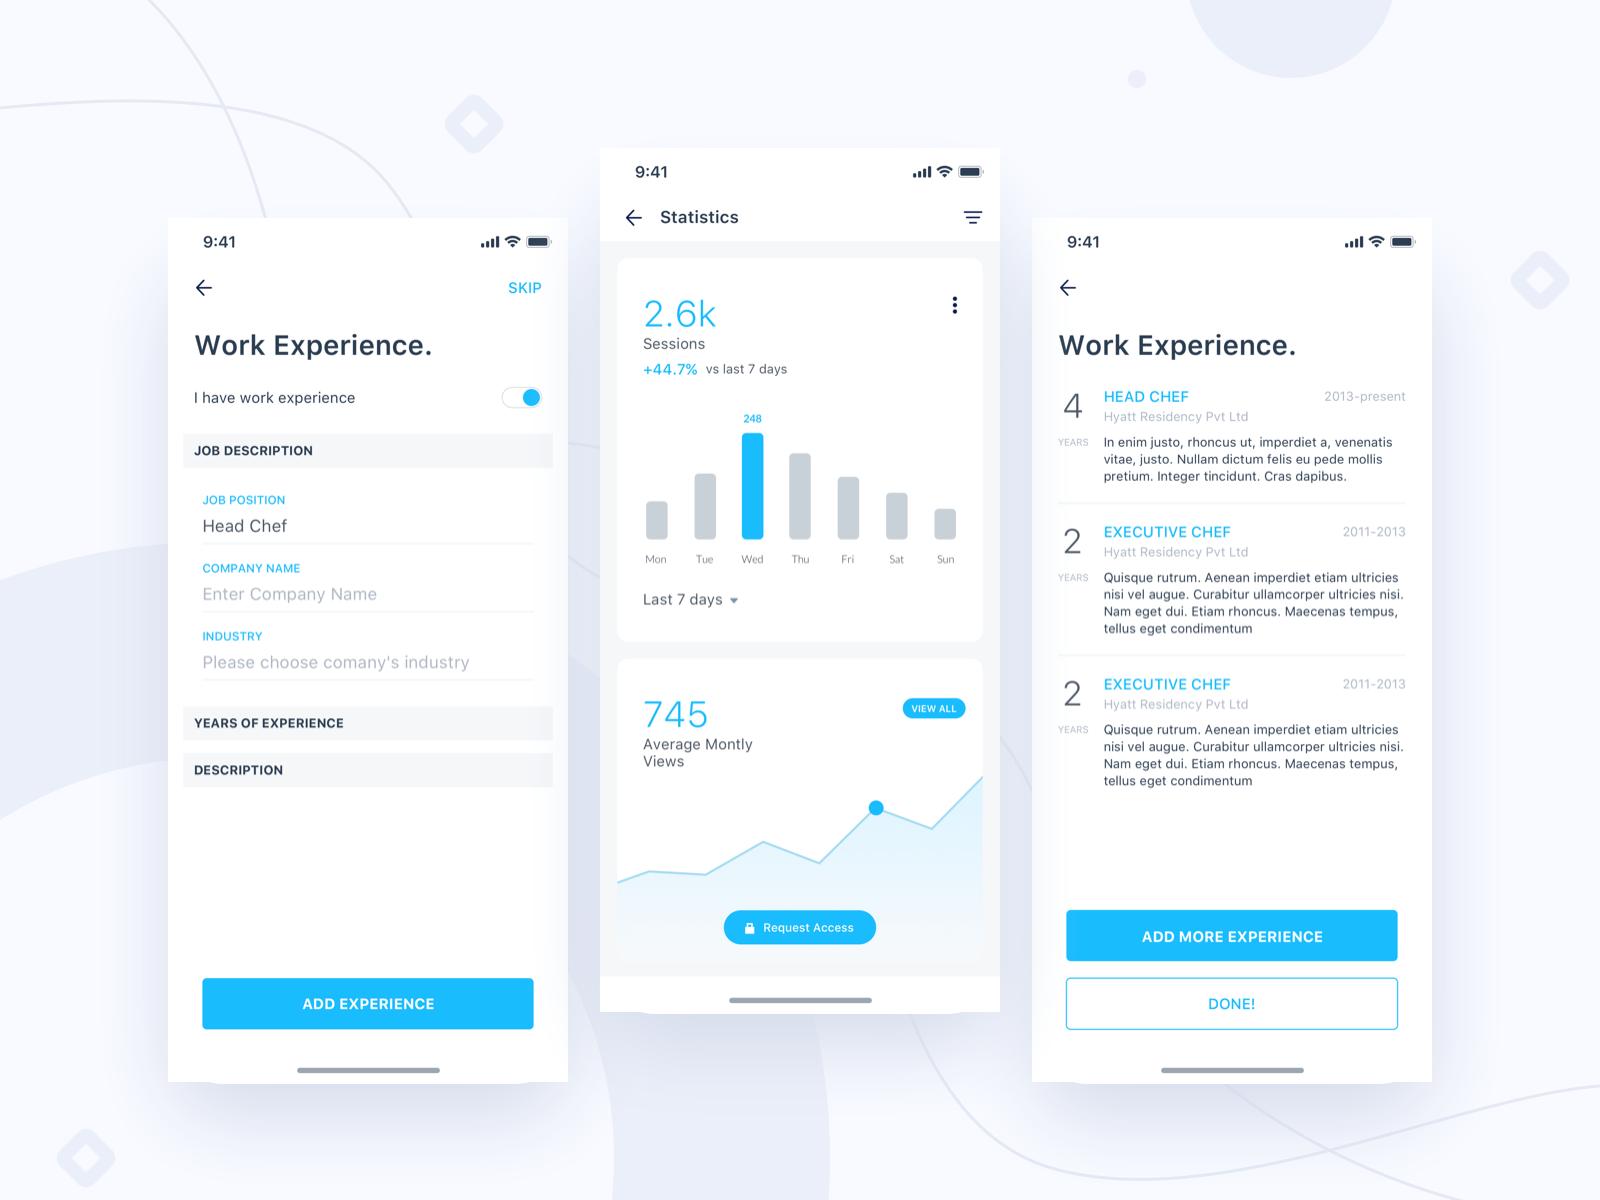 Bruvvv jobtize app 2  3 2x